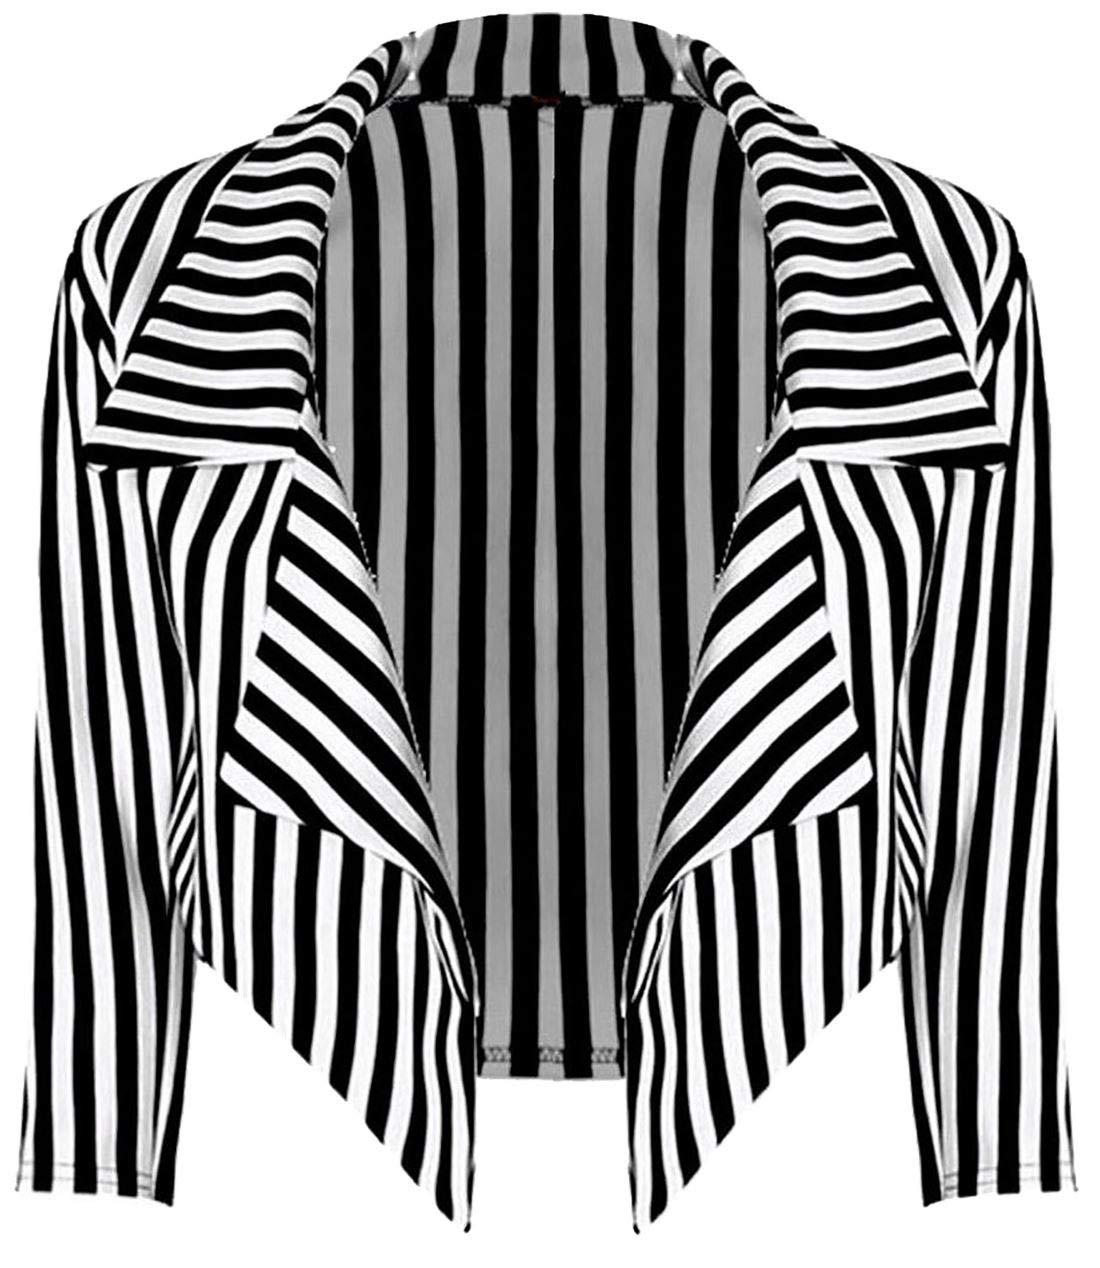 MA ONLINE Ladies Halloween Fancy Striped Cropped Blazer Full Length Leggings Women Peter Pan Dress Striped Blazer Small/Medium US 4-6 by MA ONLINE (Image #1)